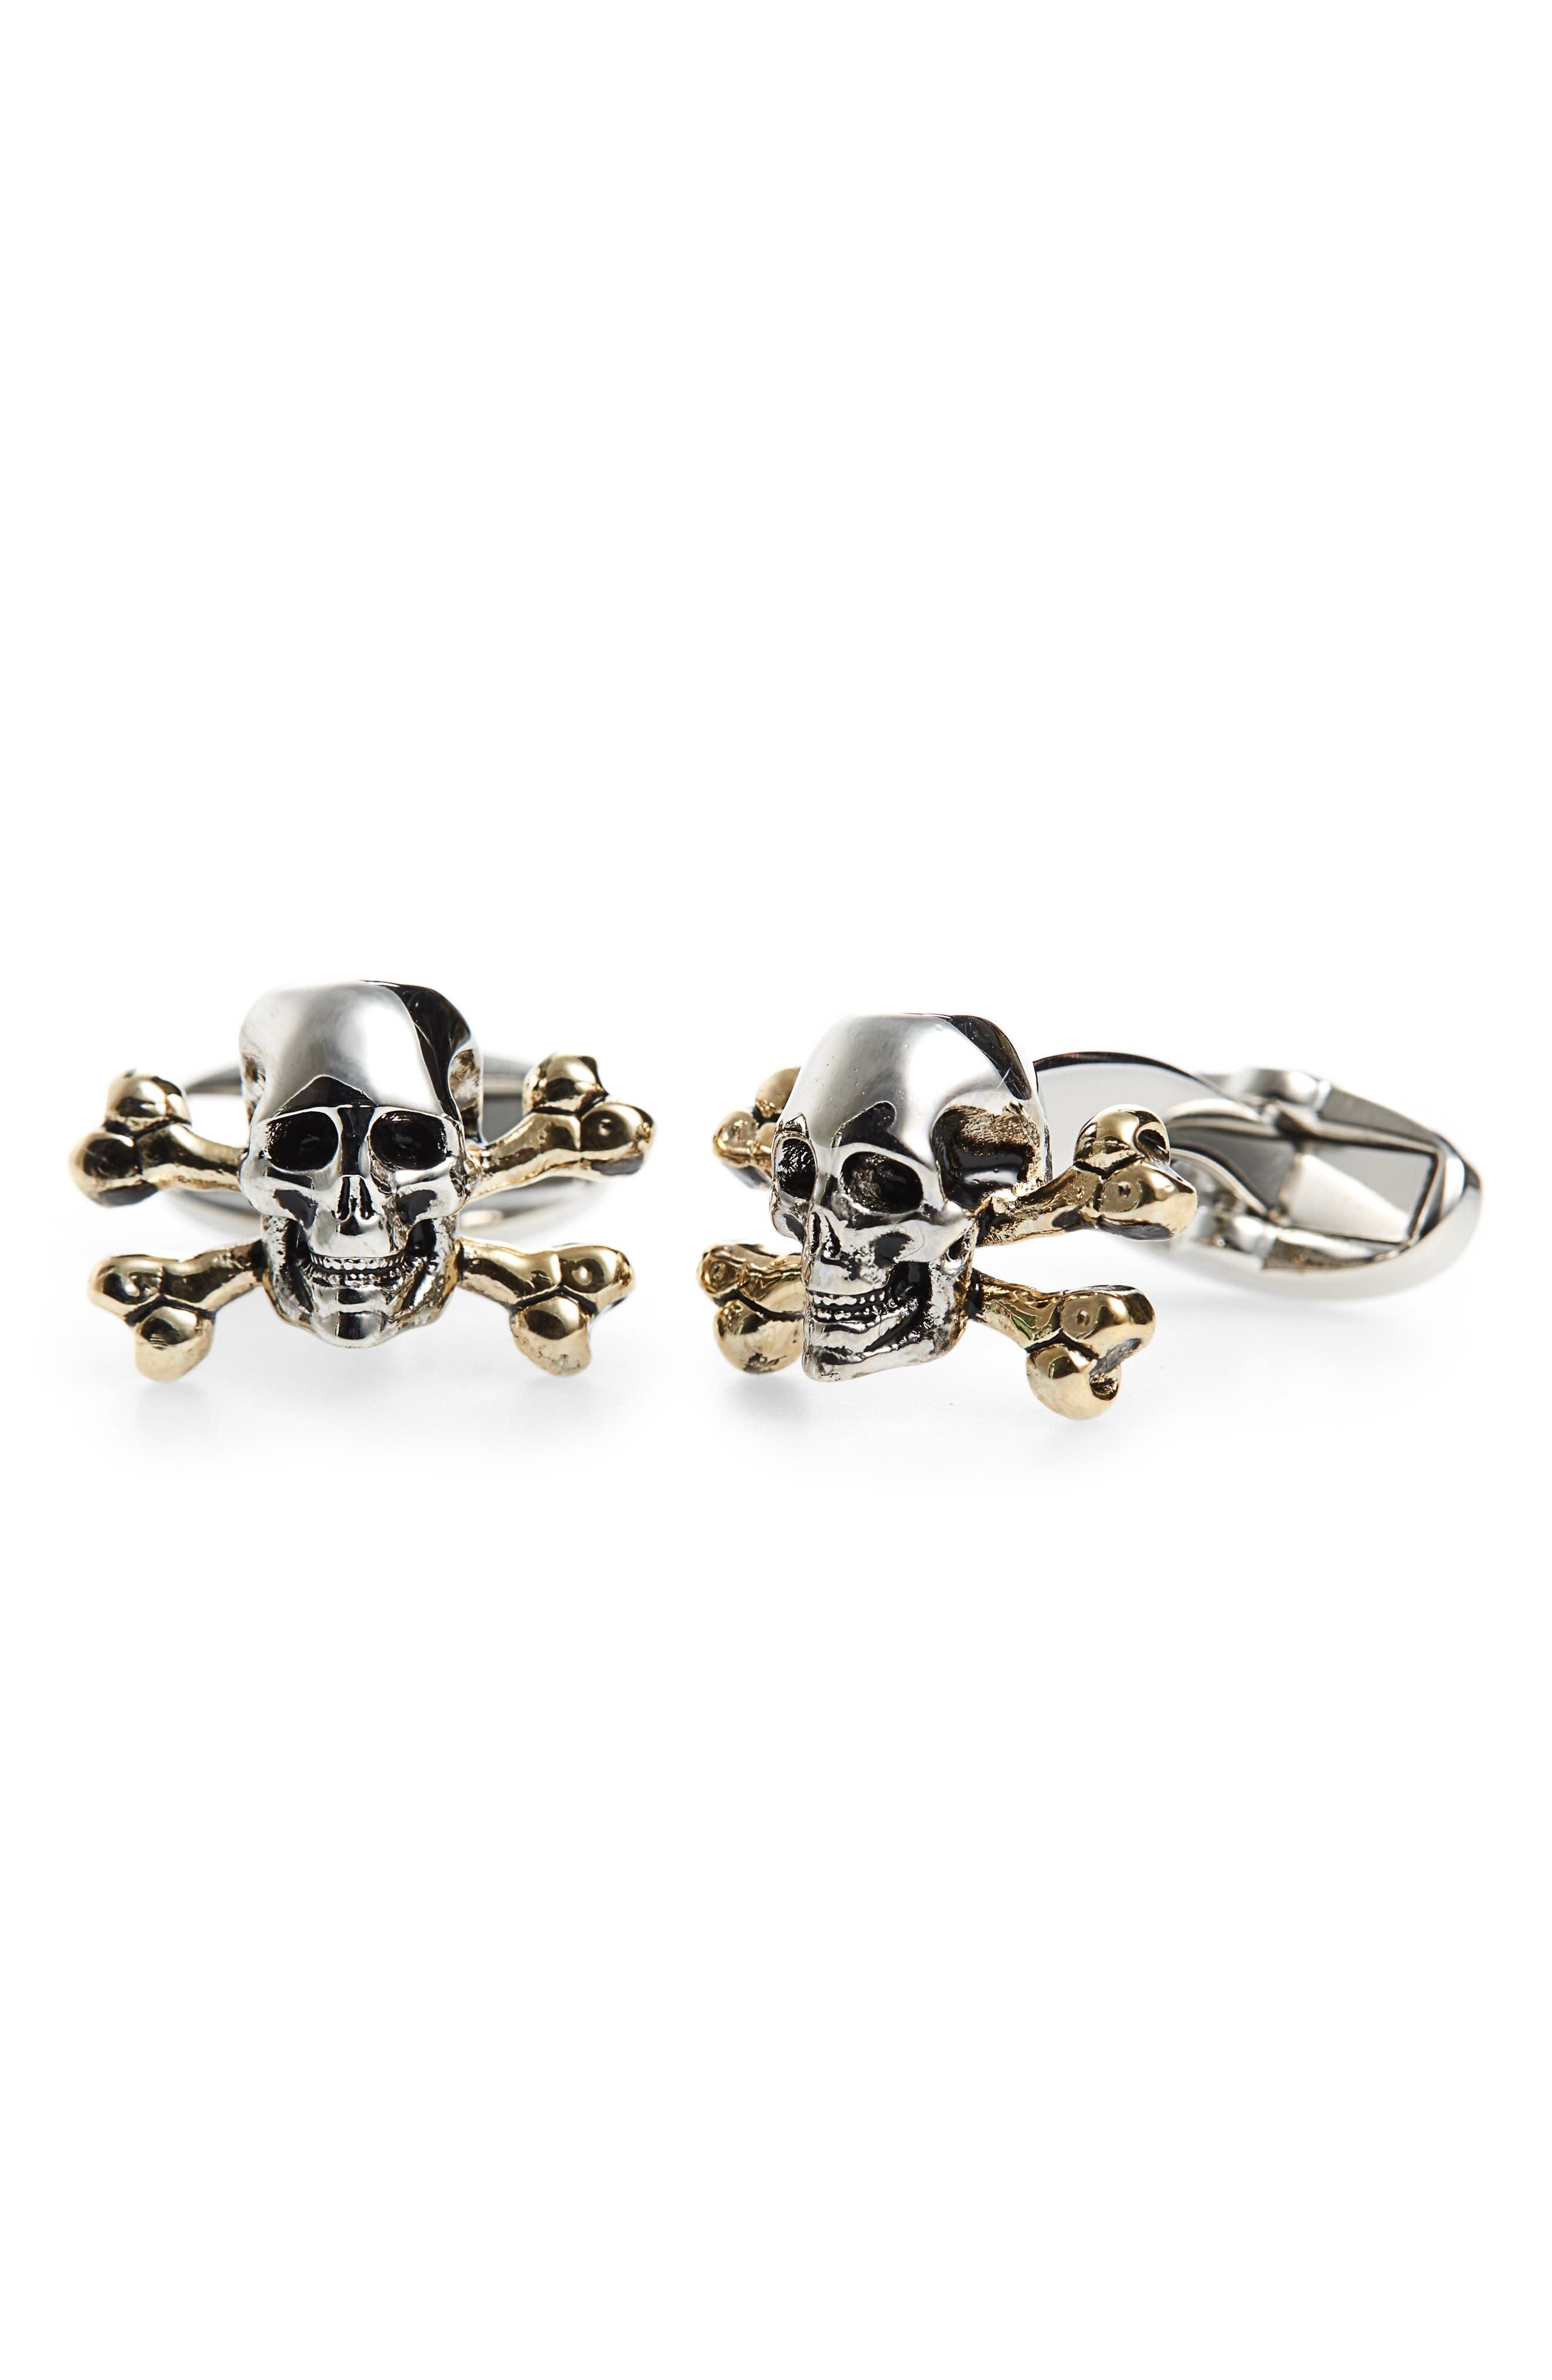 Paul Smith Skull Cuff Links